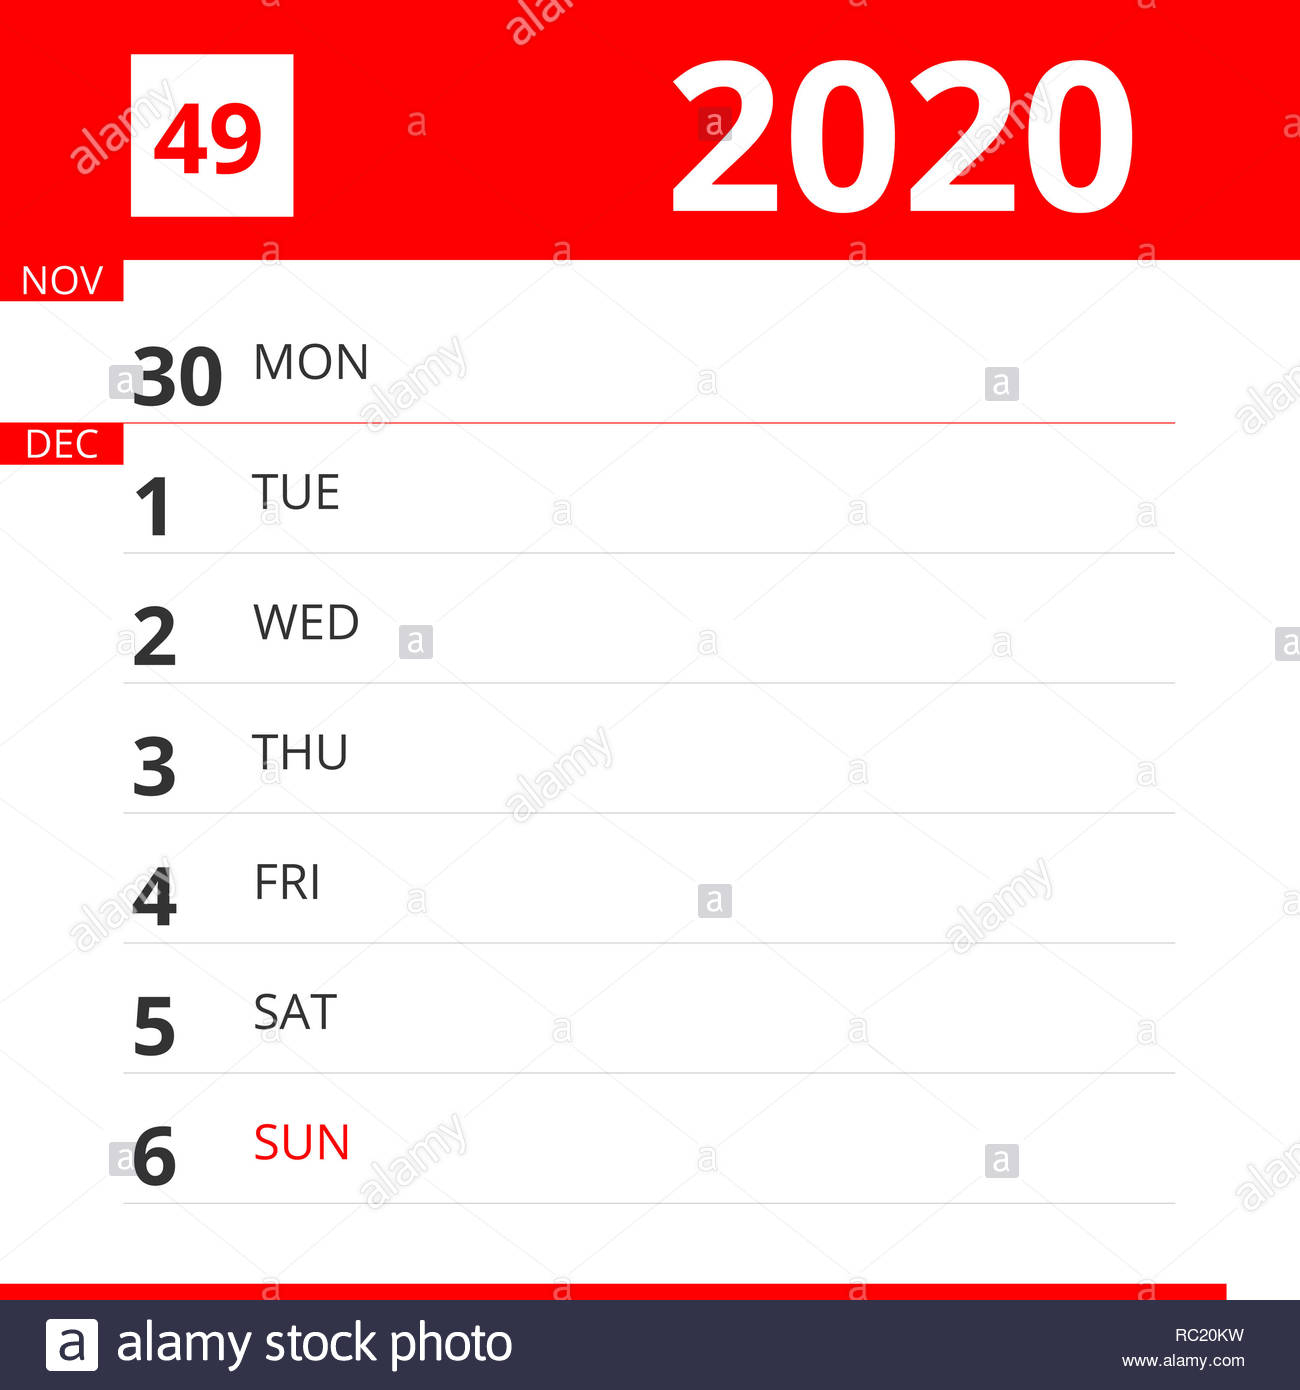 Calendar Planner For Week 49 In 2020, Ends December 6, 2020